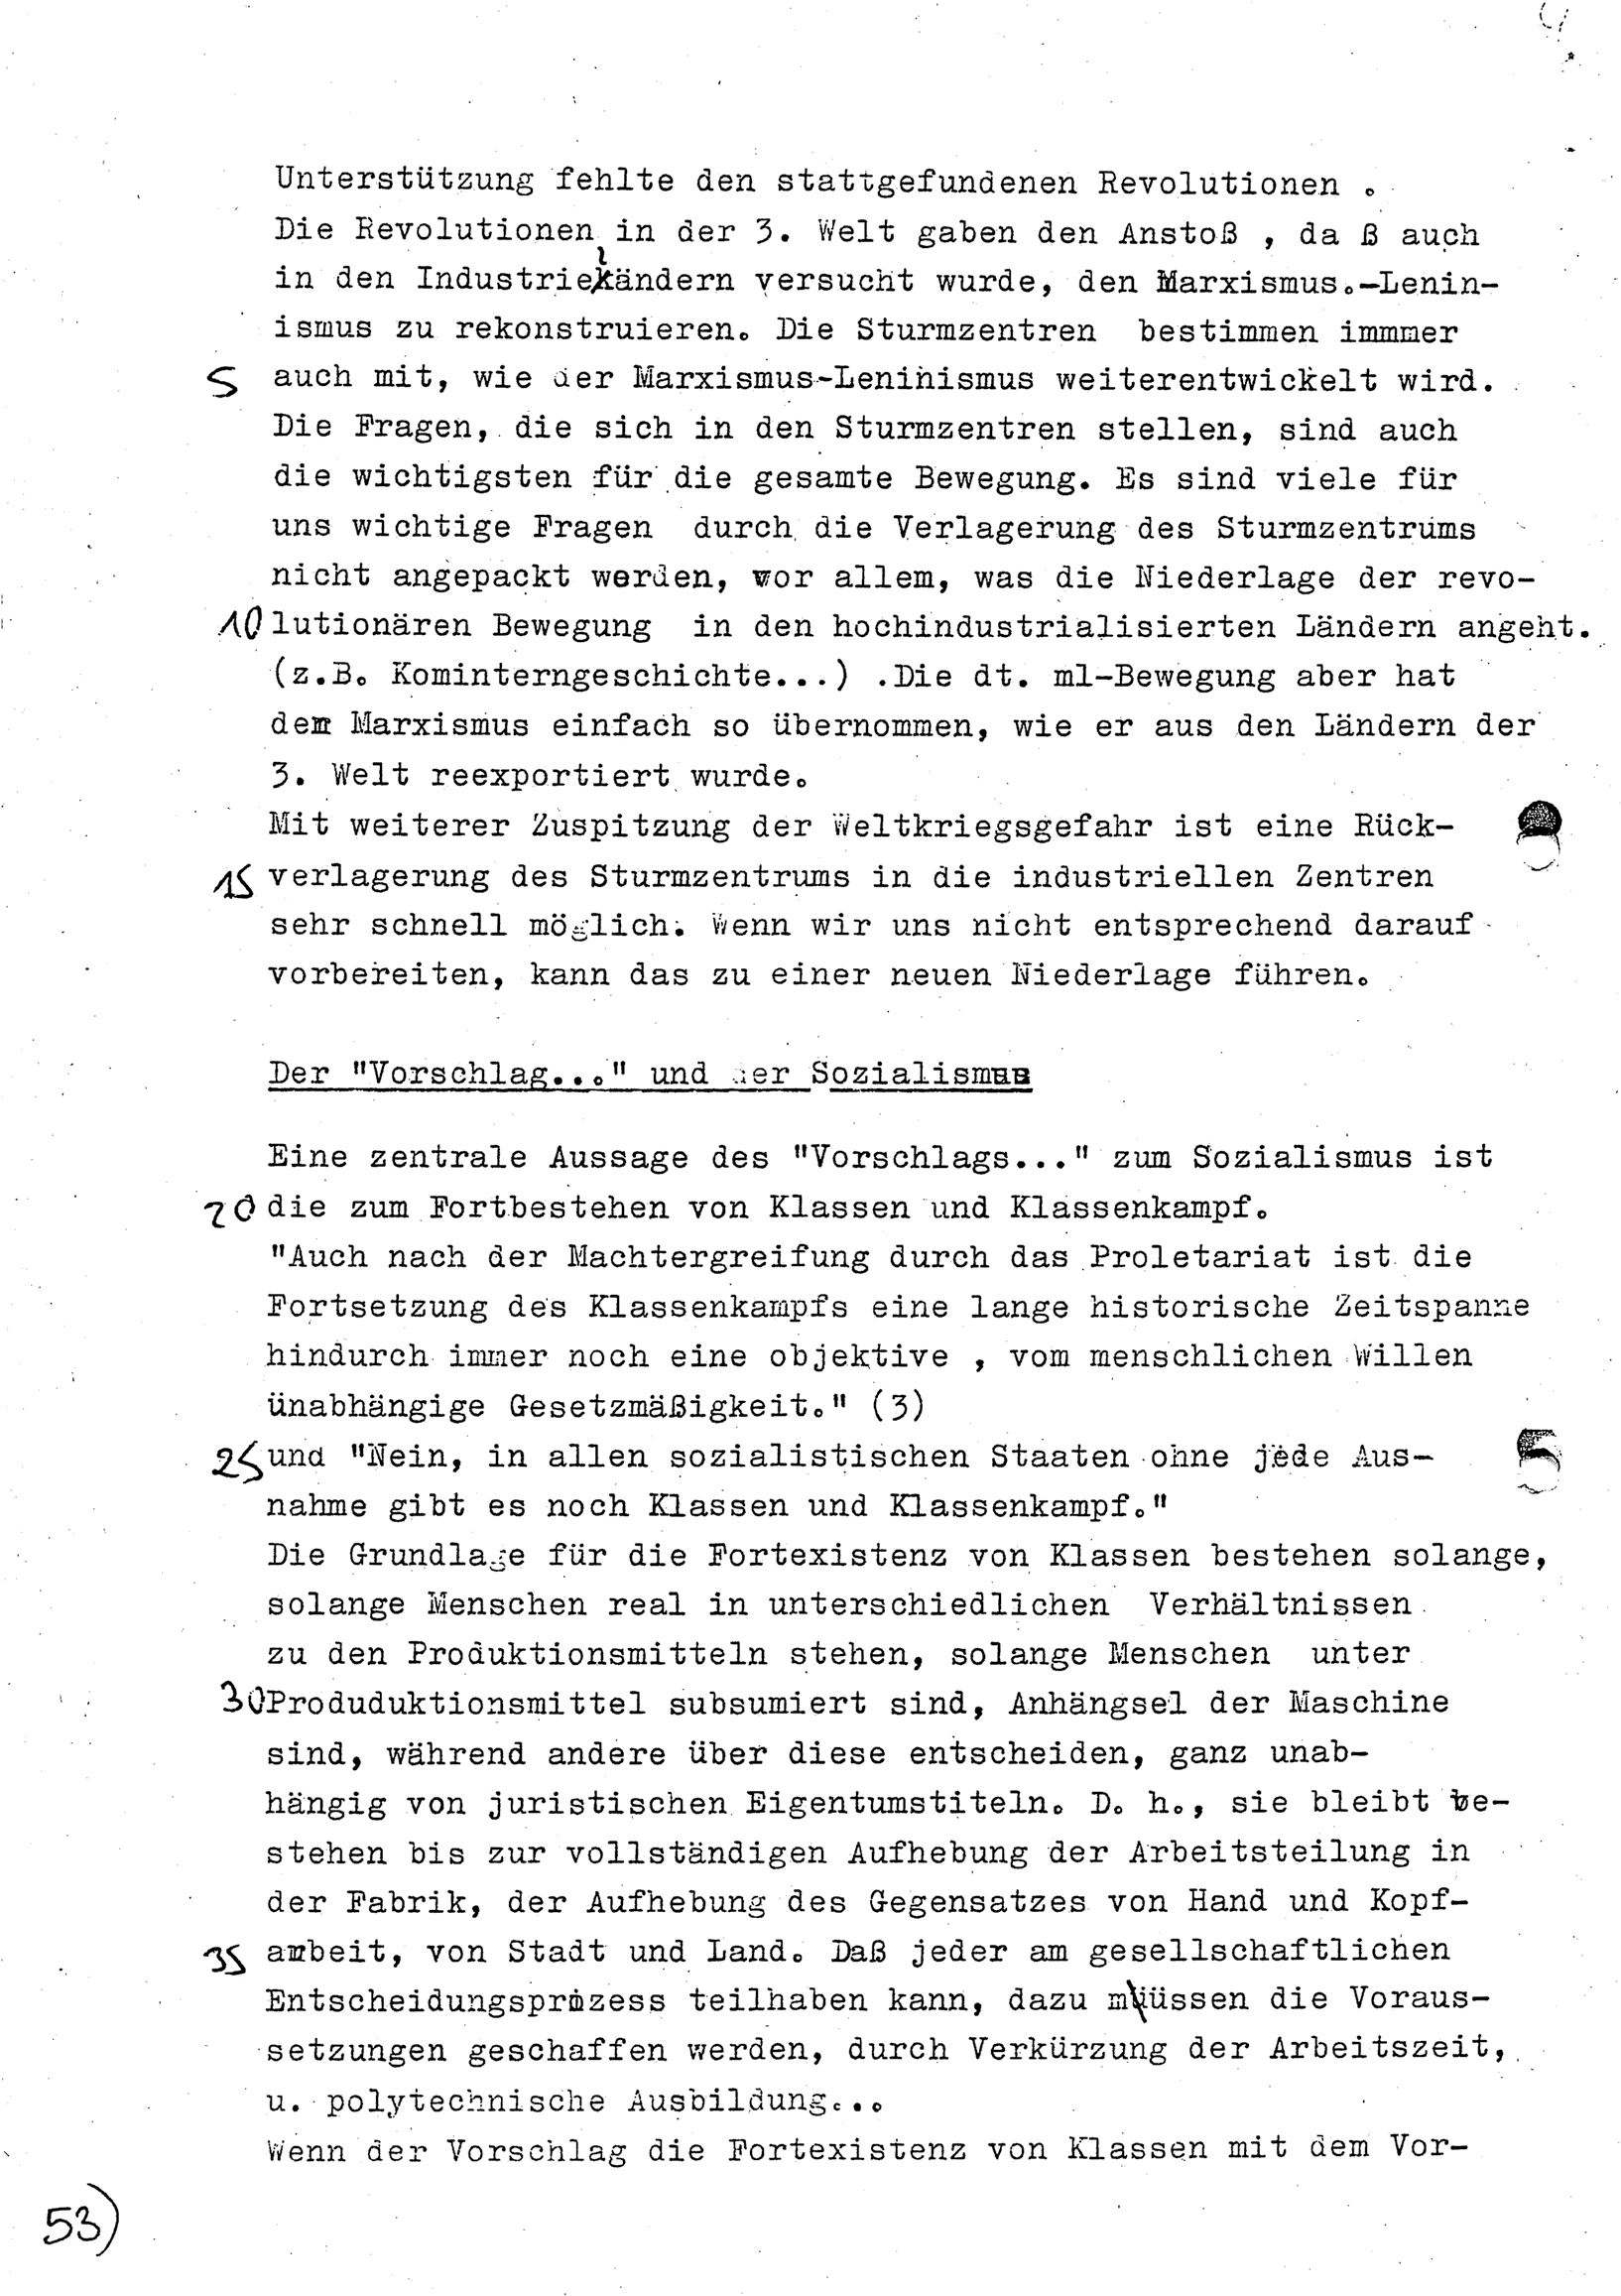 Ulm_KGU_Arbeitsheft_19830425_015_056